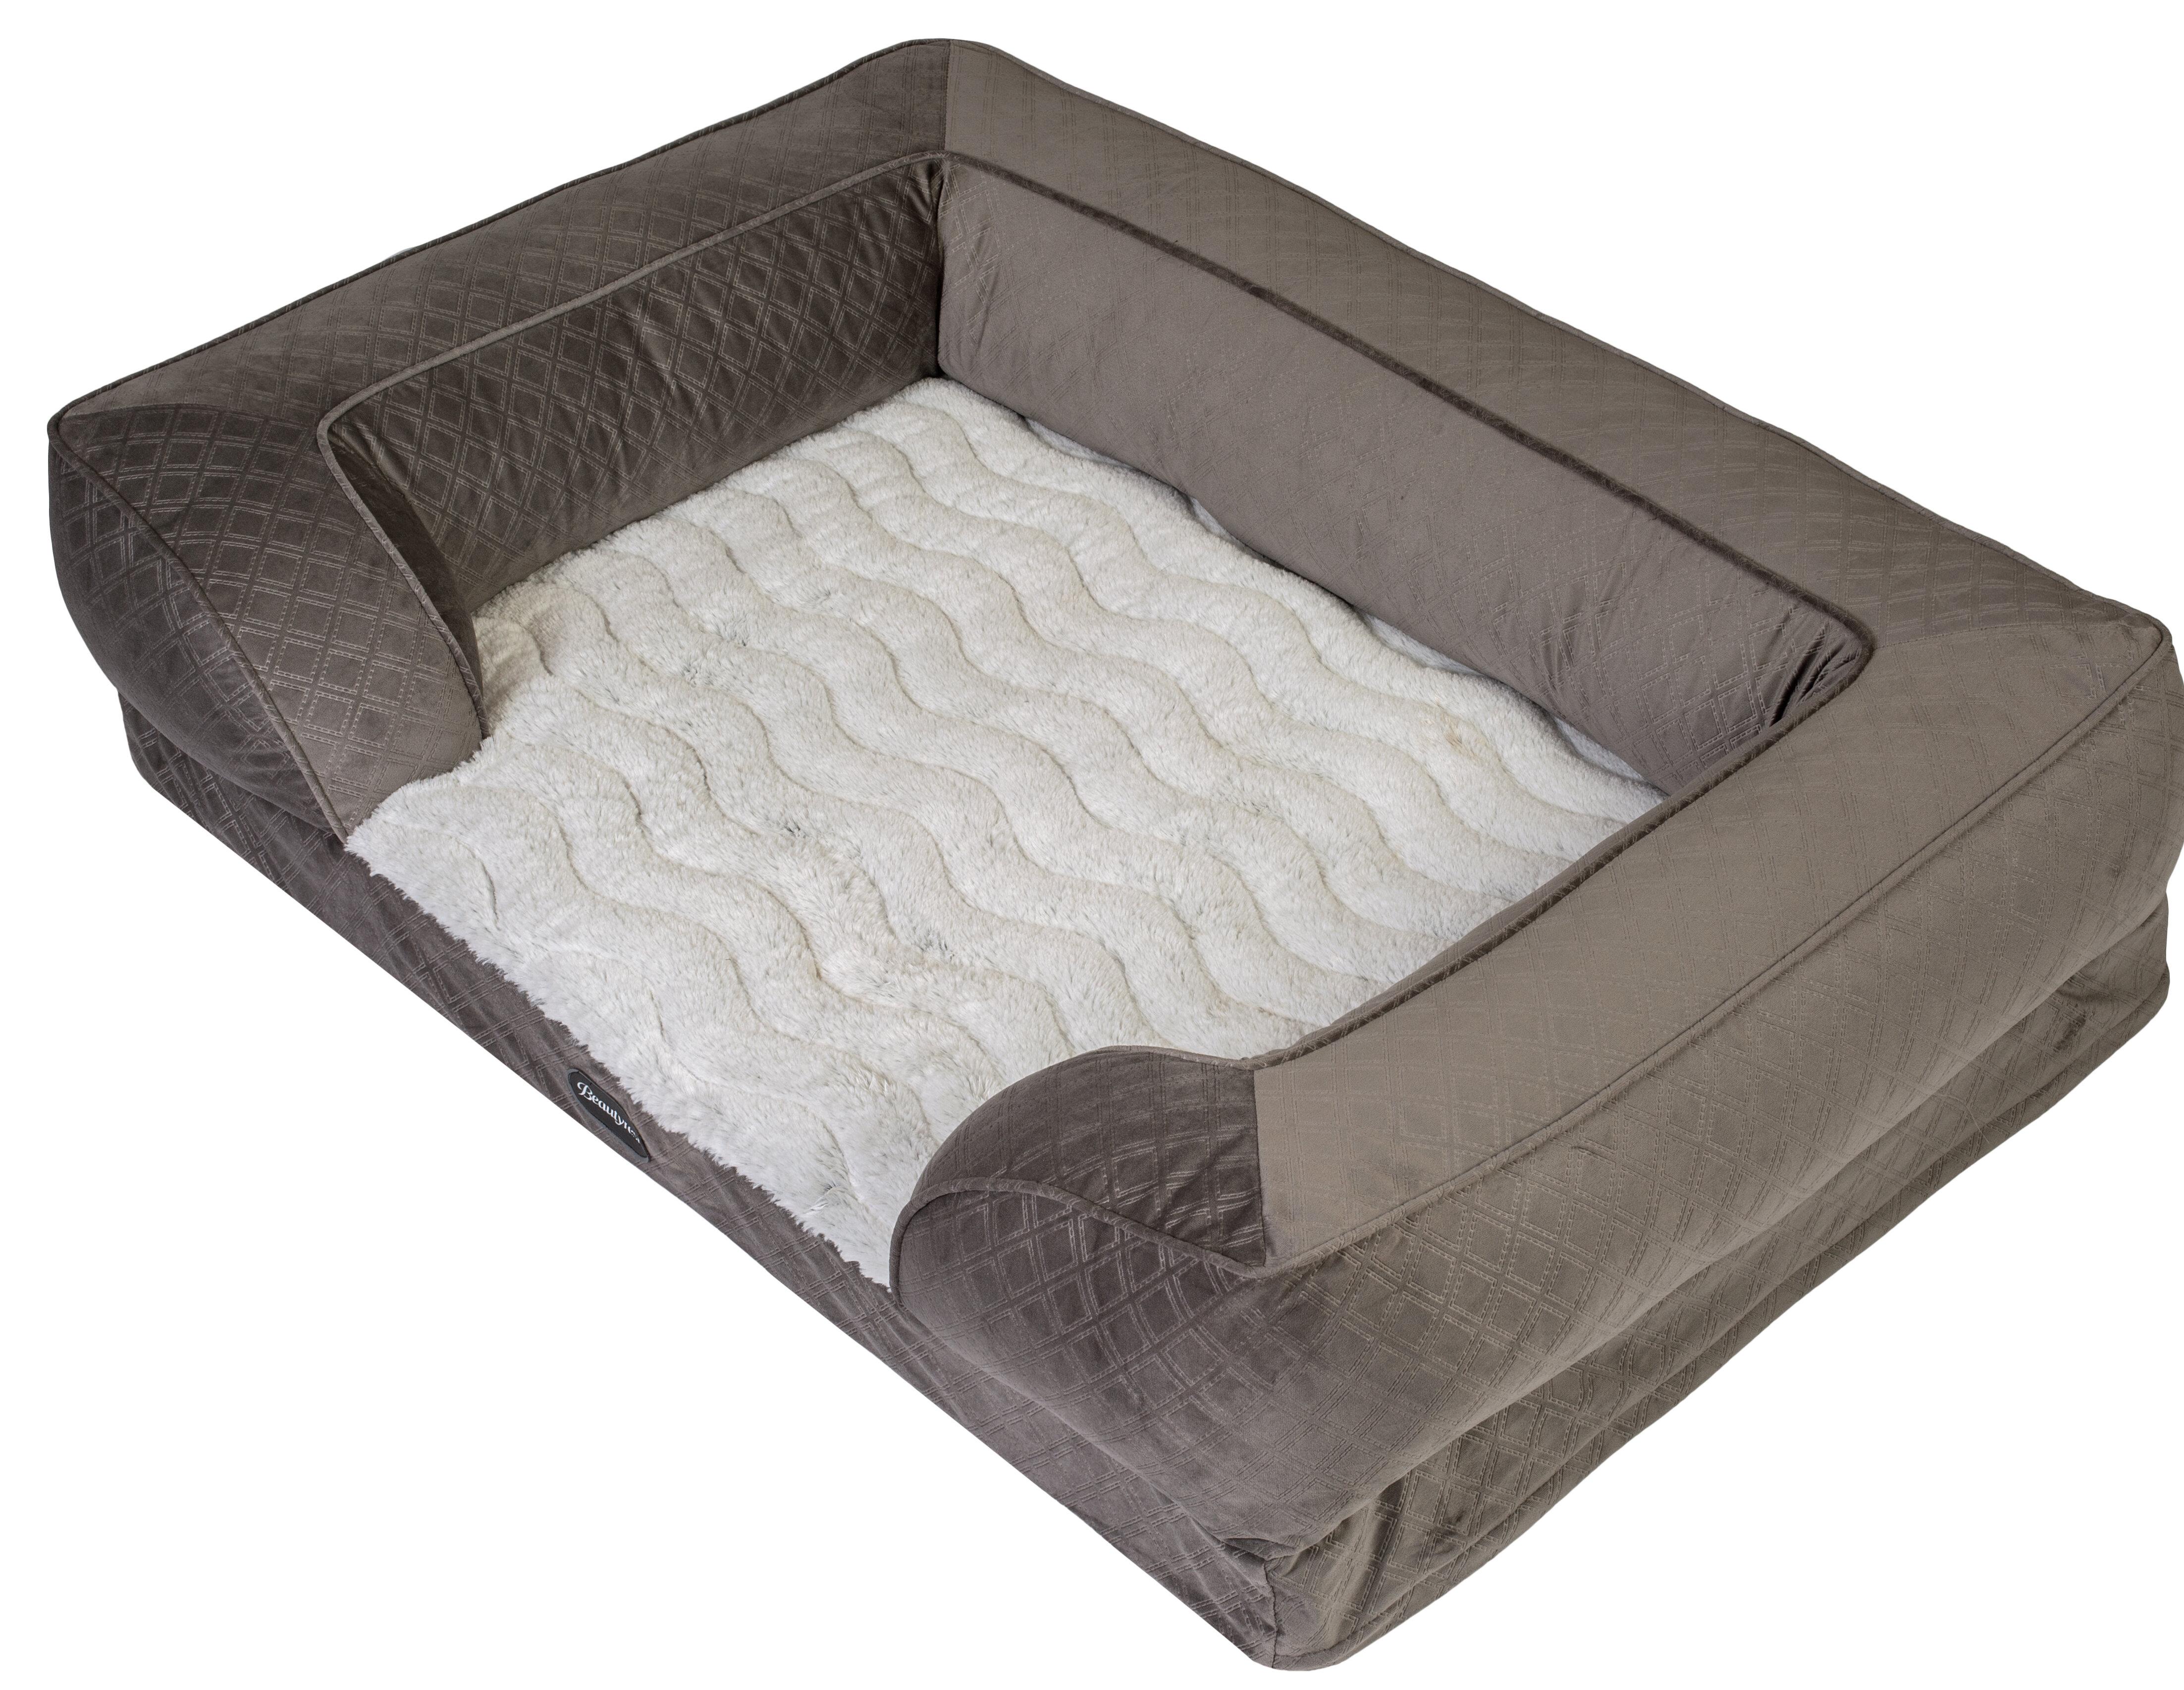 Beautyrest Supreme Comfort Couch Pet Bed Reviews Wayfair